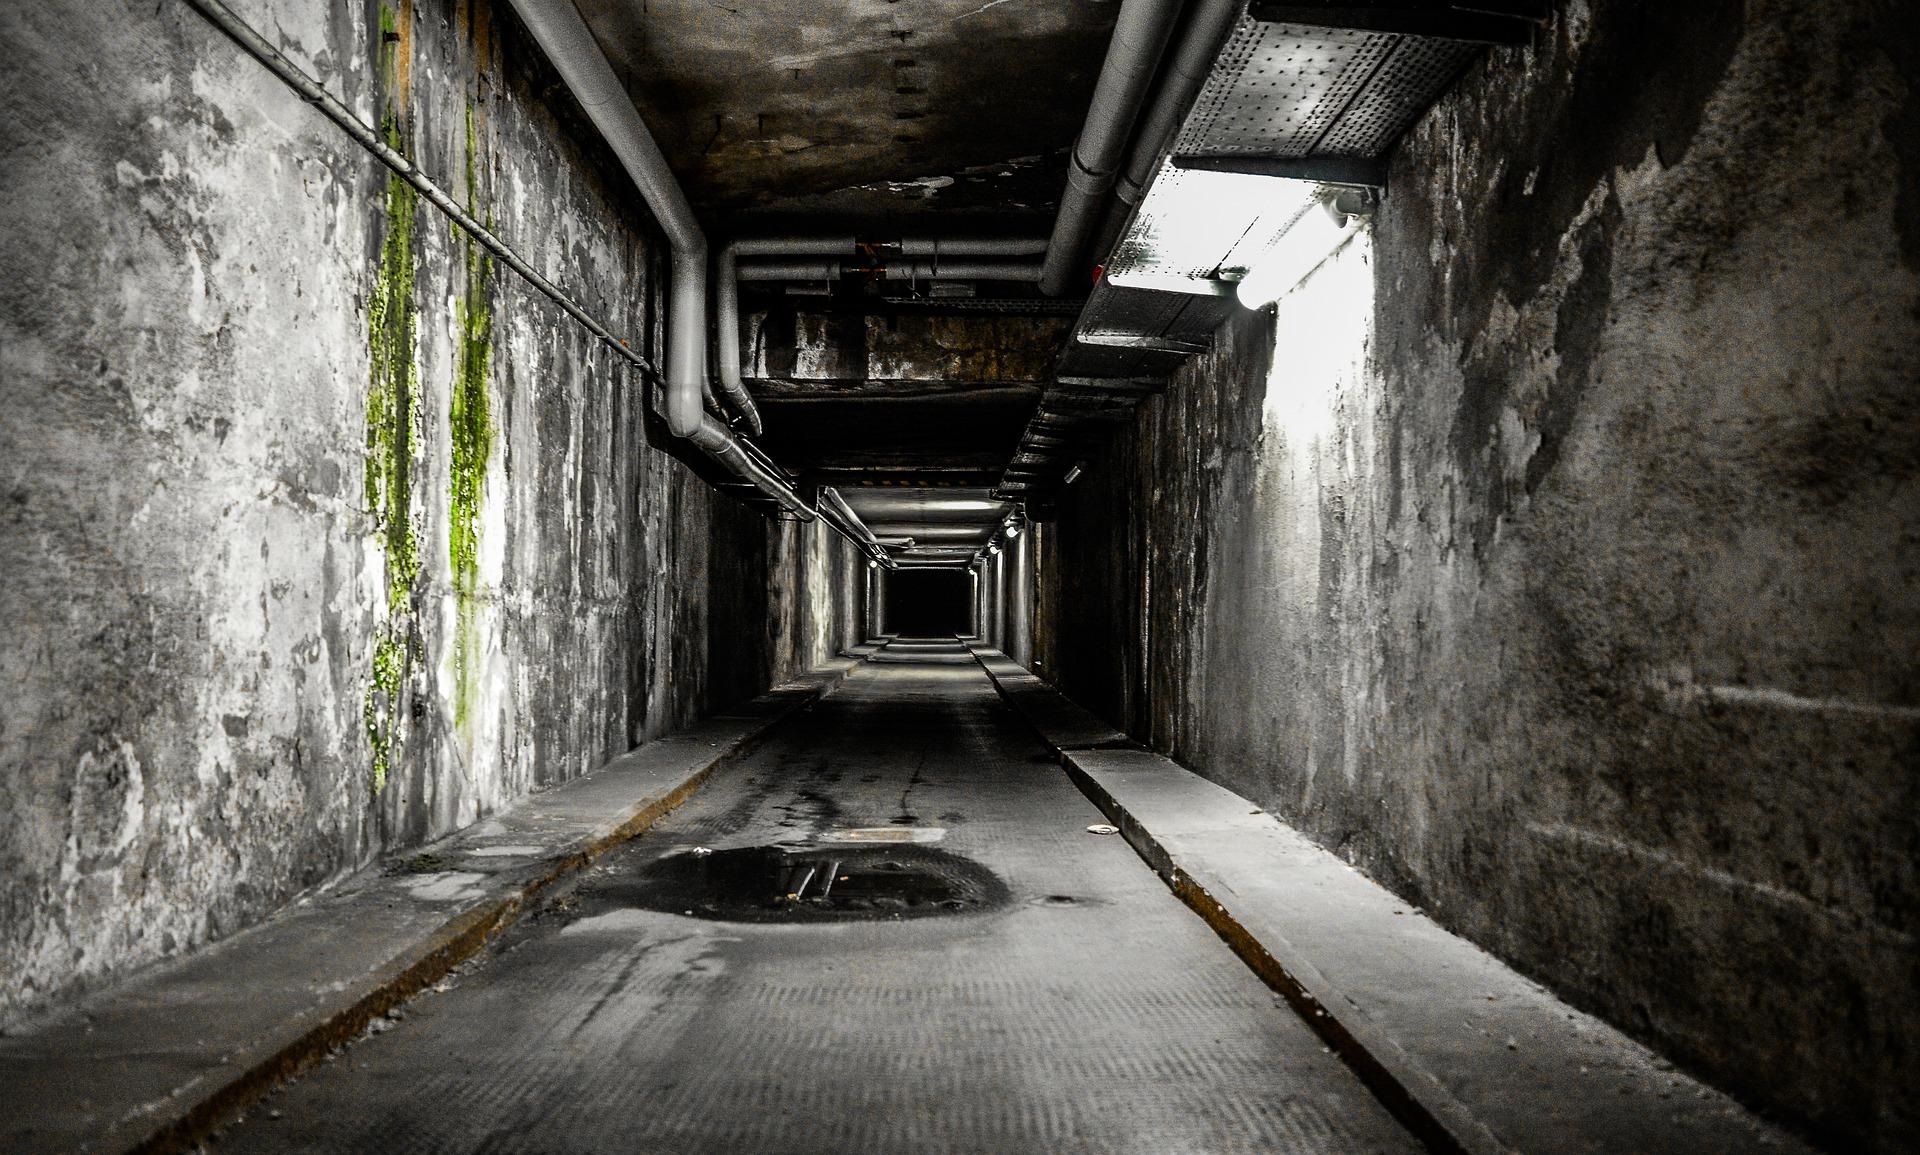 passage, tunnel, Chill, peur, ténèbres - Fonds d'écran HD - Professor-falken.com